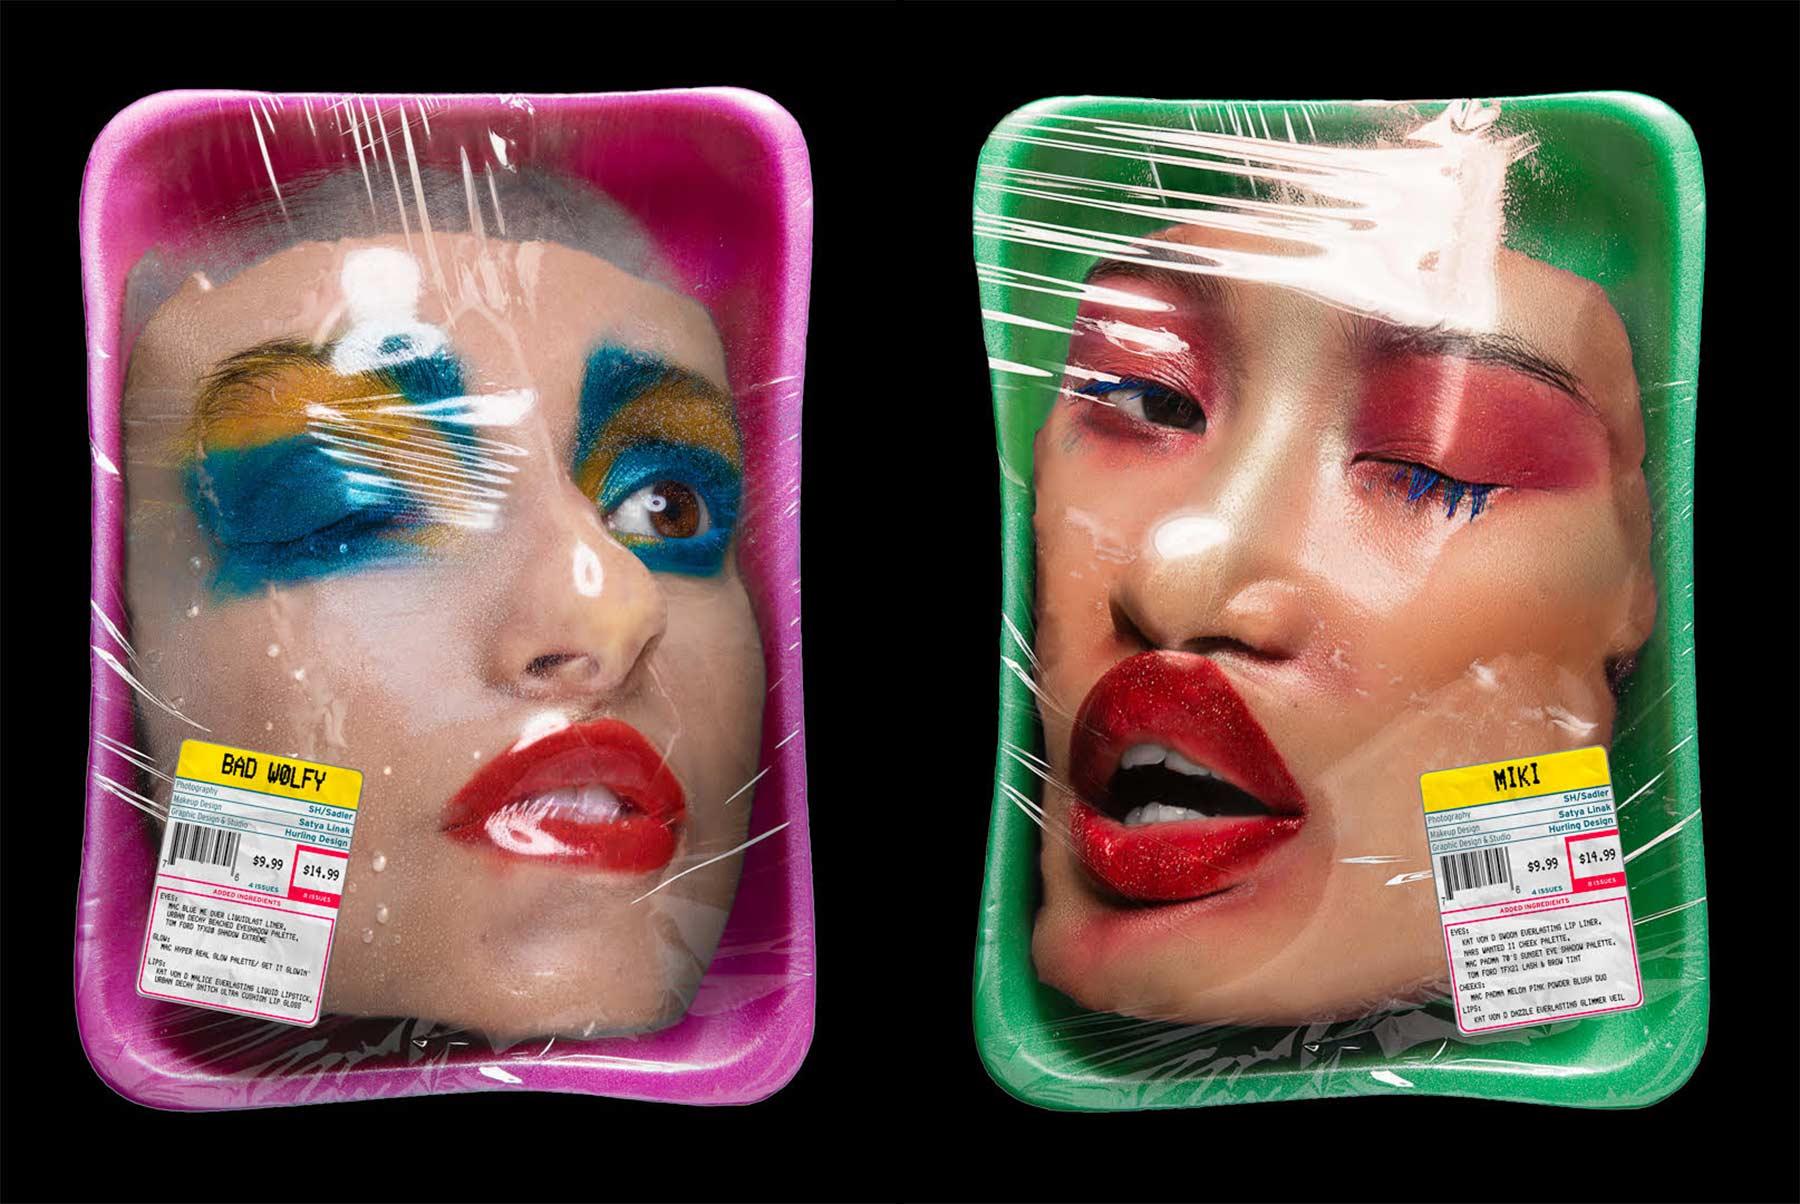 Frisch abgepackte Model-Gesichter